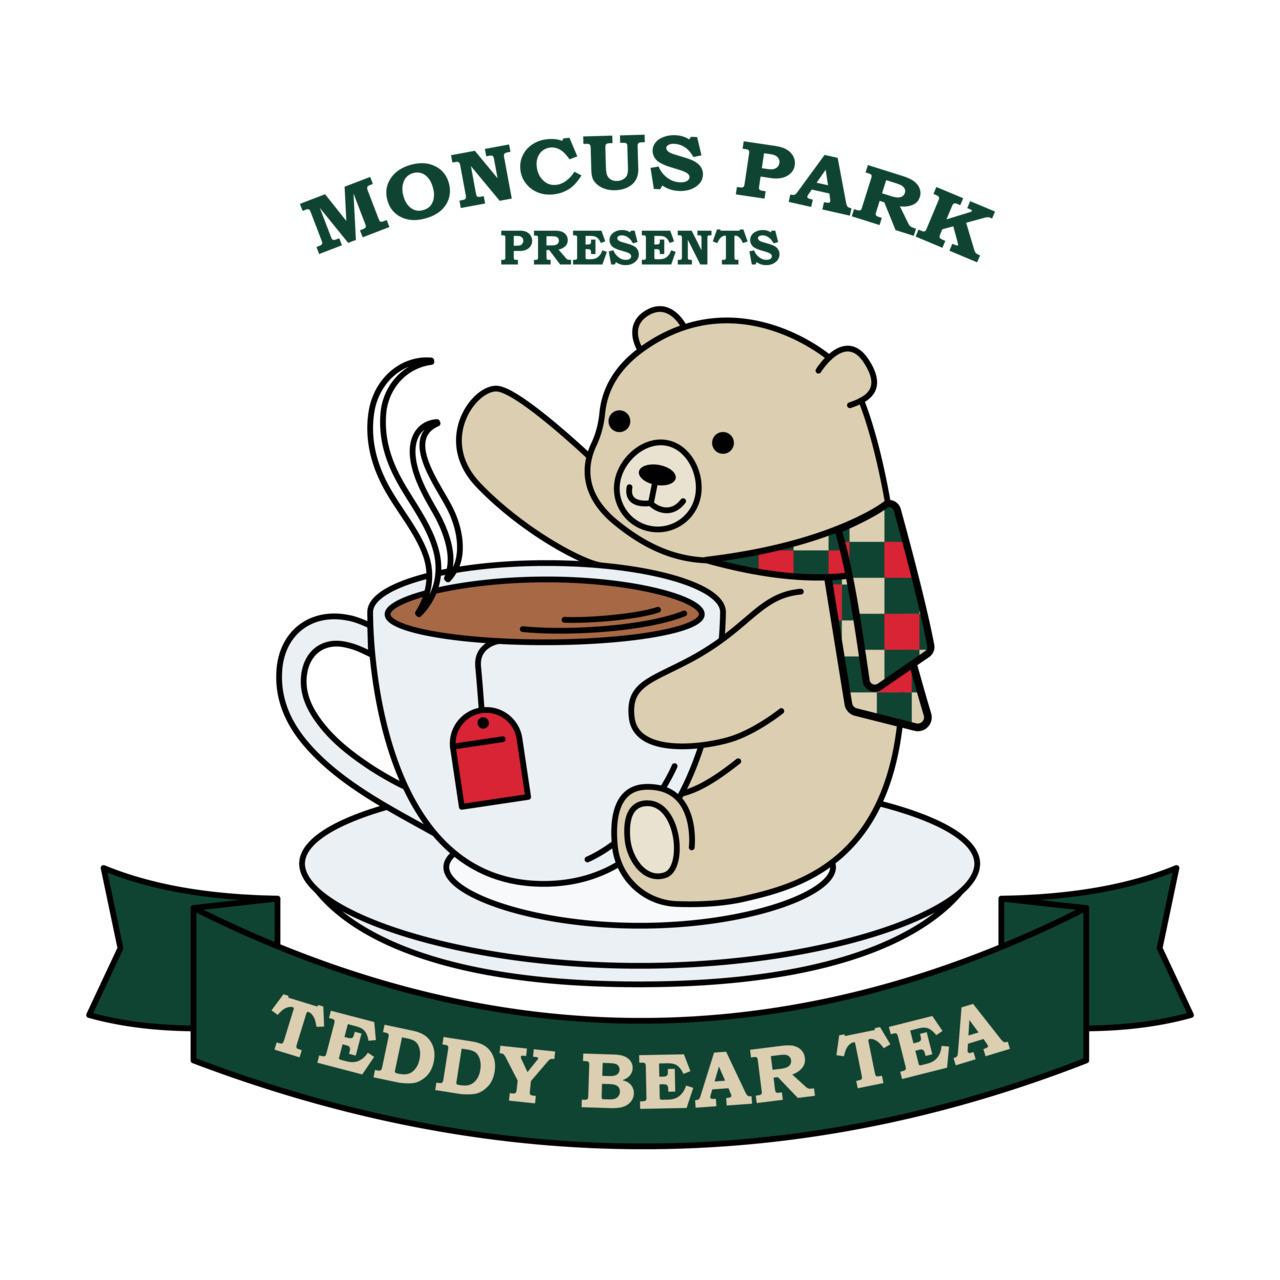 2021 - Teddy Bear Tea 2:00 PM Seating